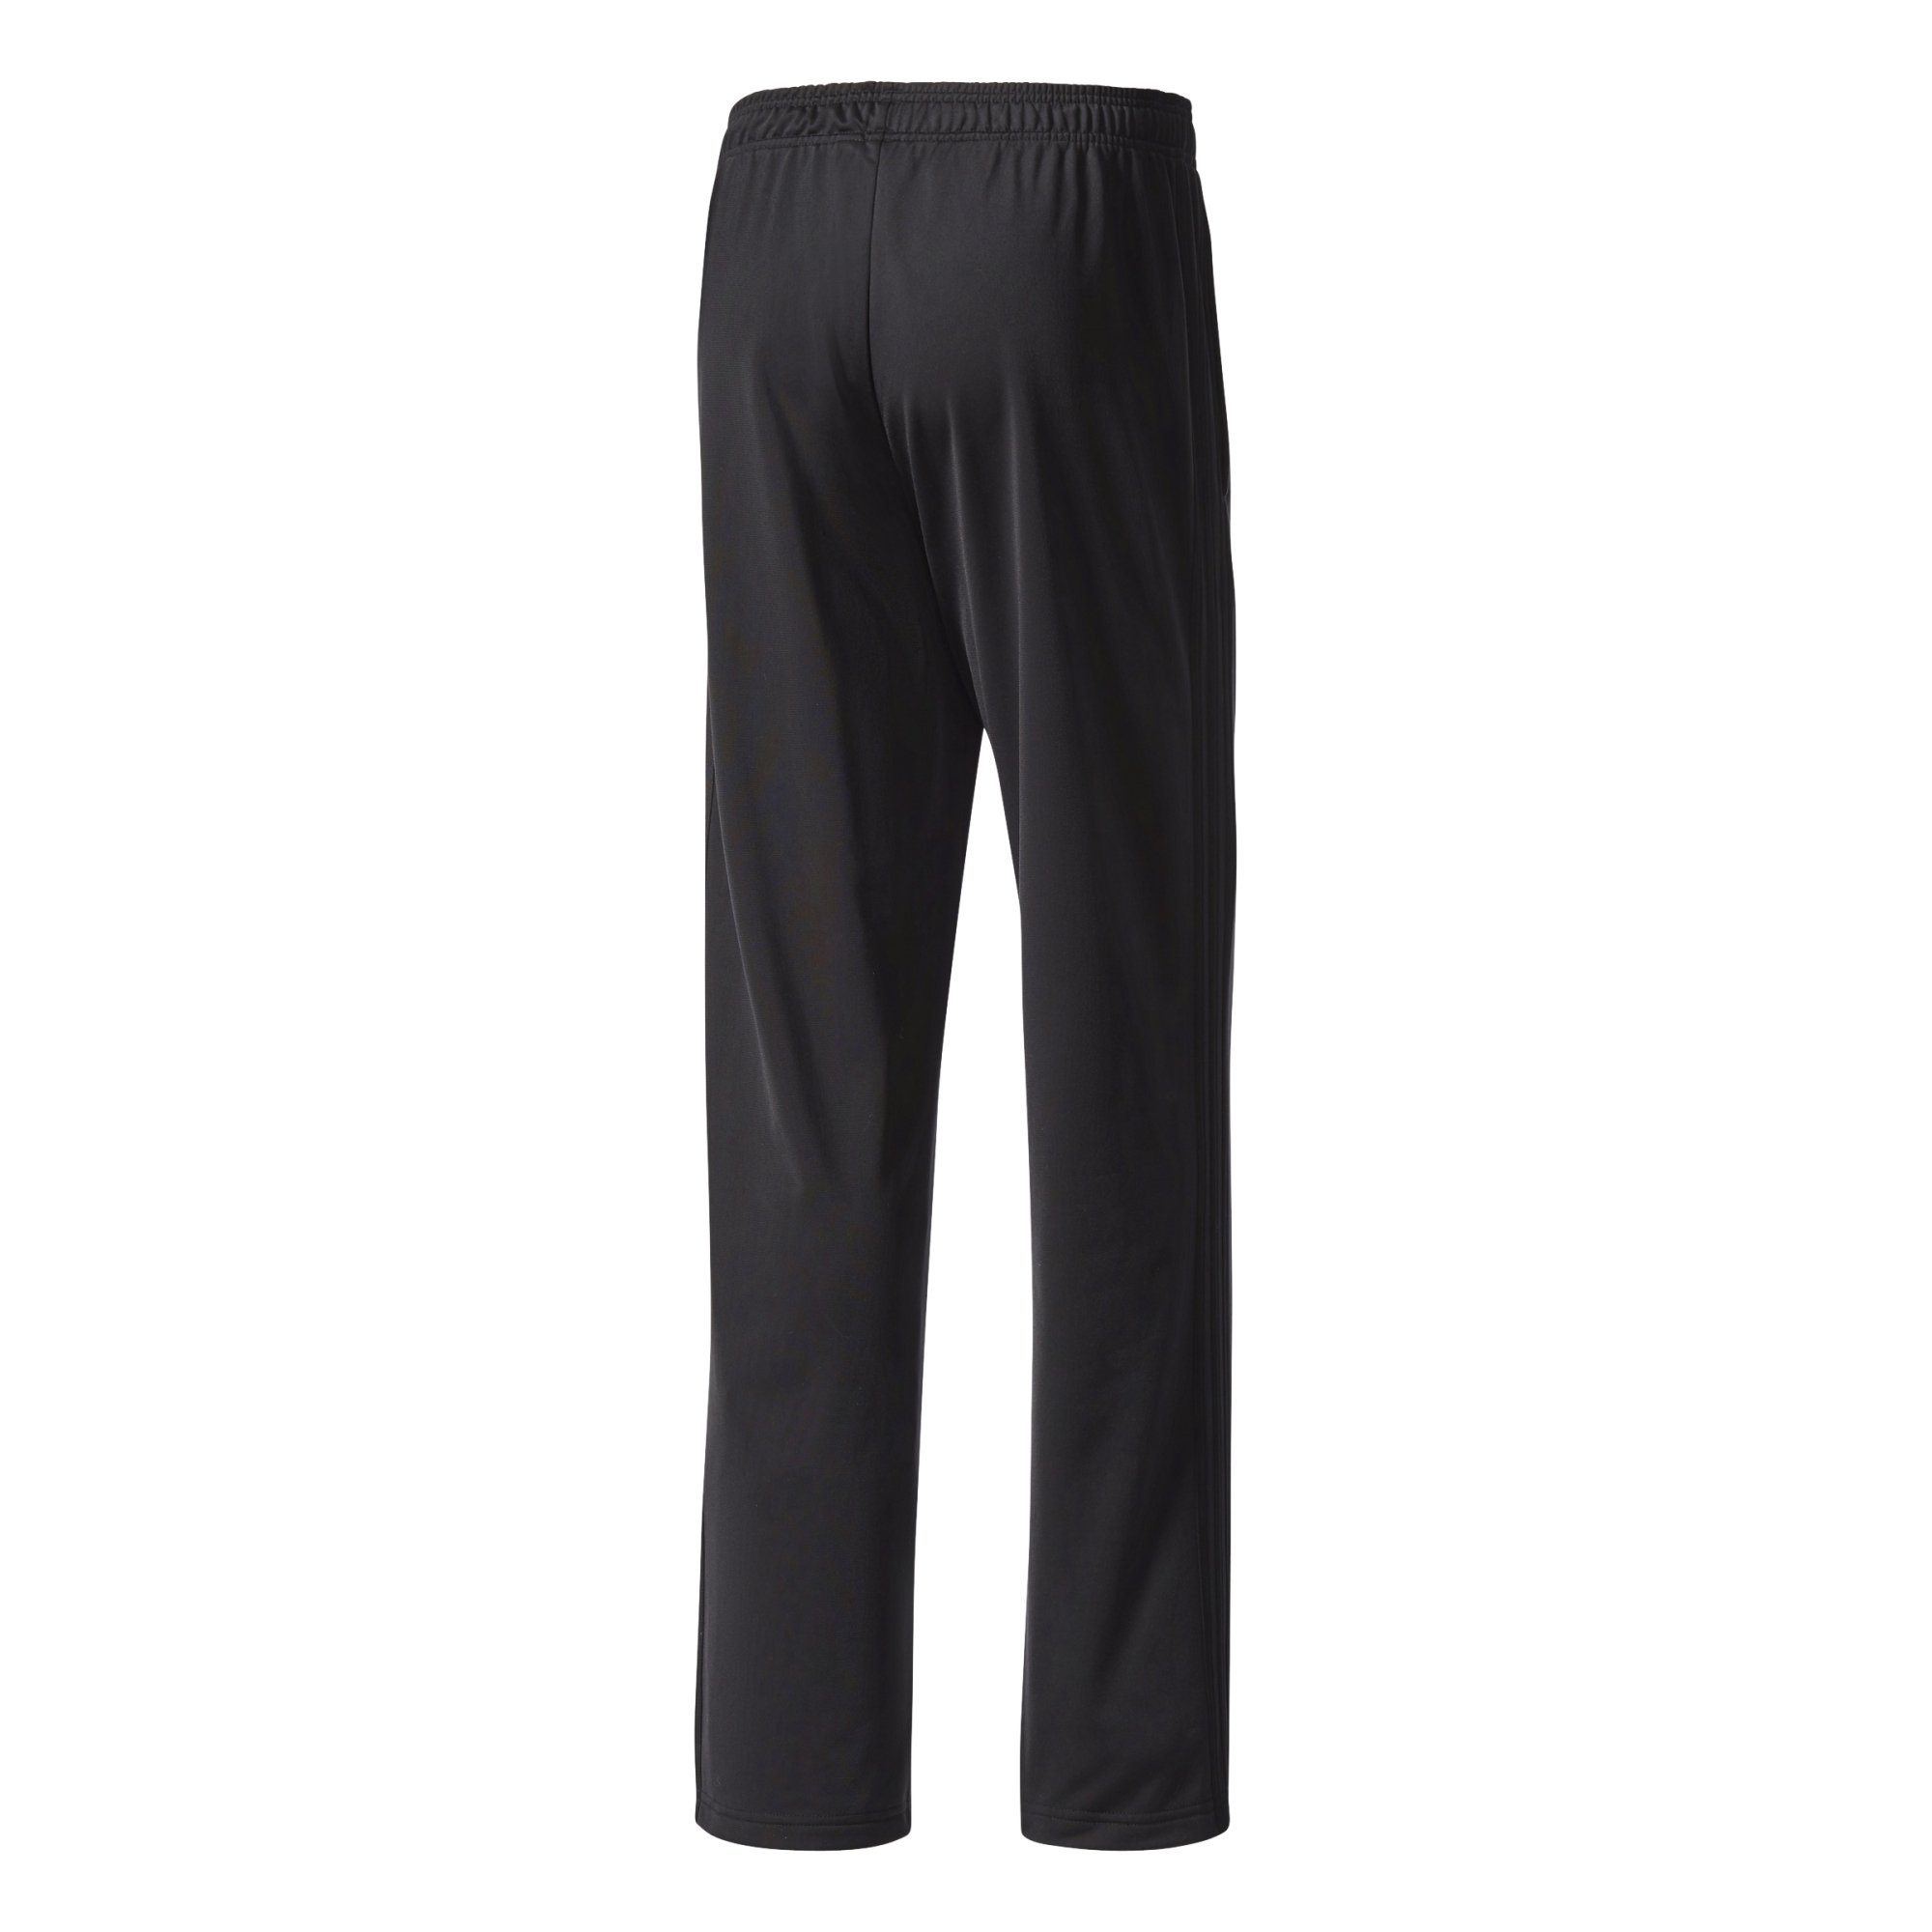 adidas Men's Athletics Essential Tricot 3-Stripe Pants, Black/Black, Small by adidas (Image #4)